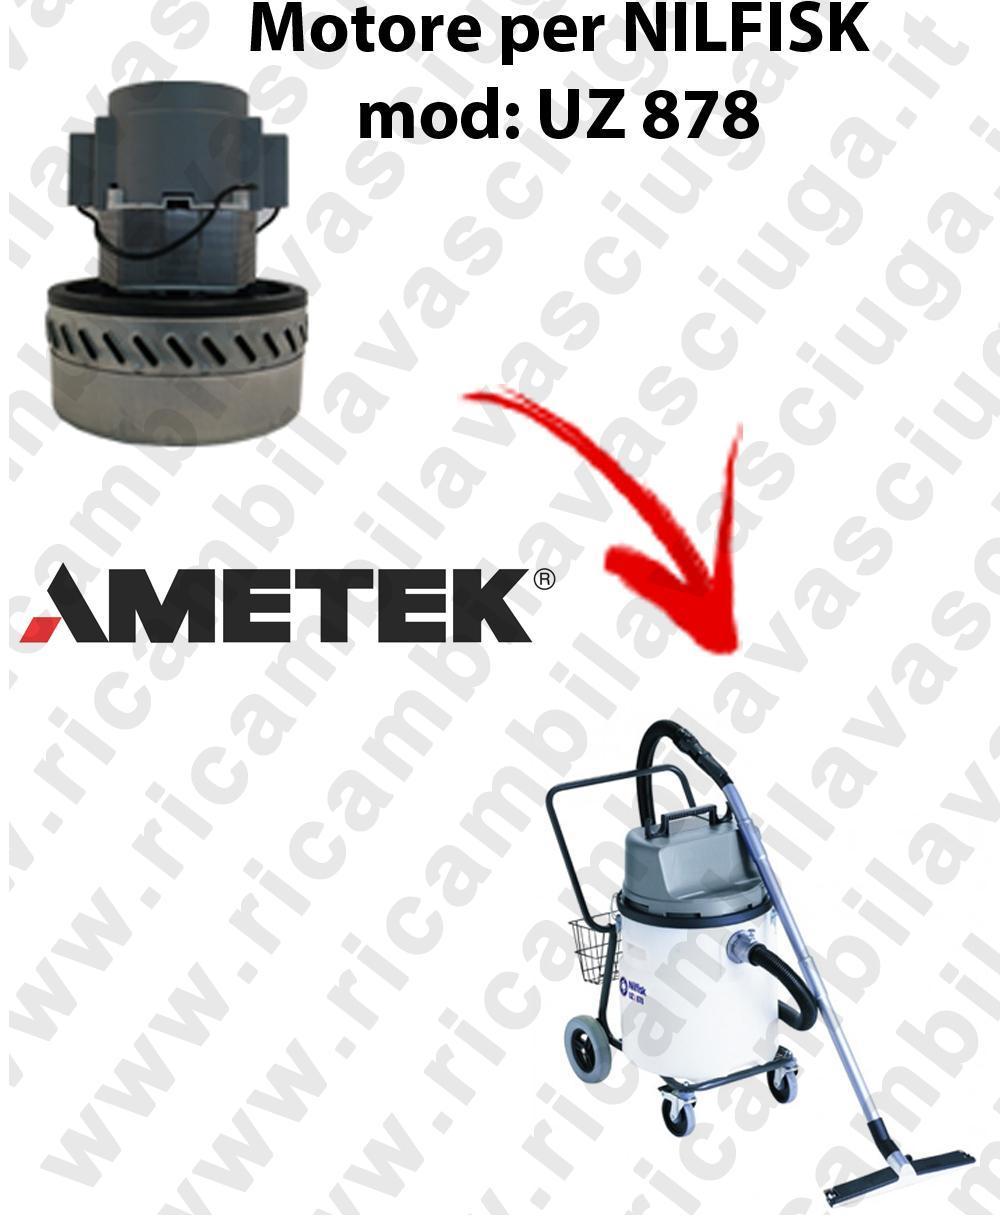 UZ 878 Saugmotor AMETEK für Staubsauger NILFISK